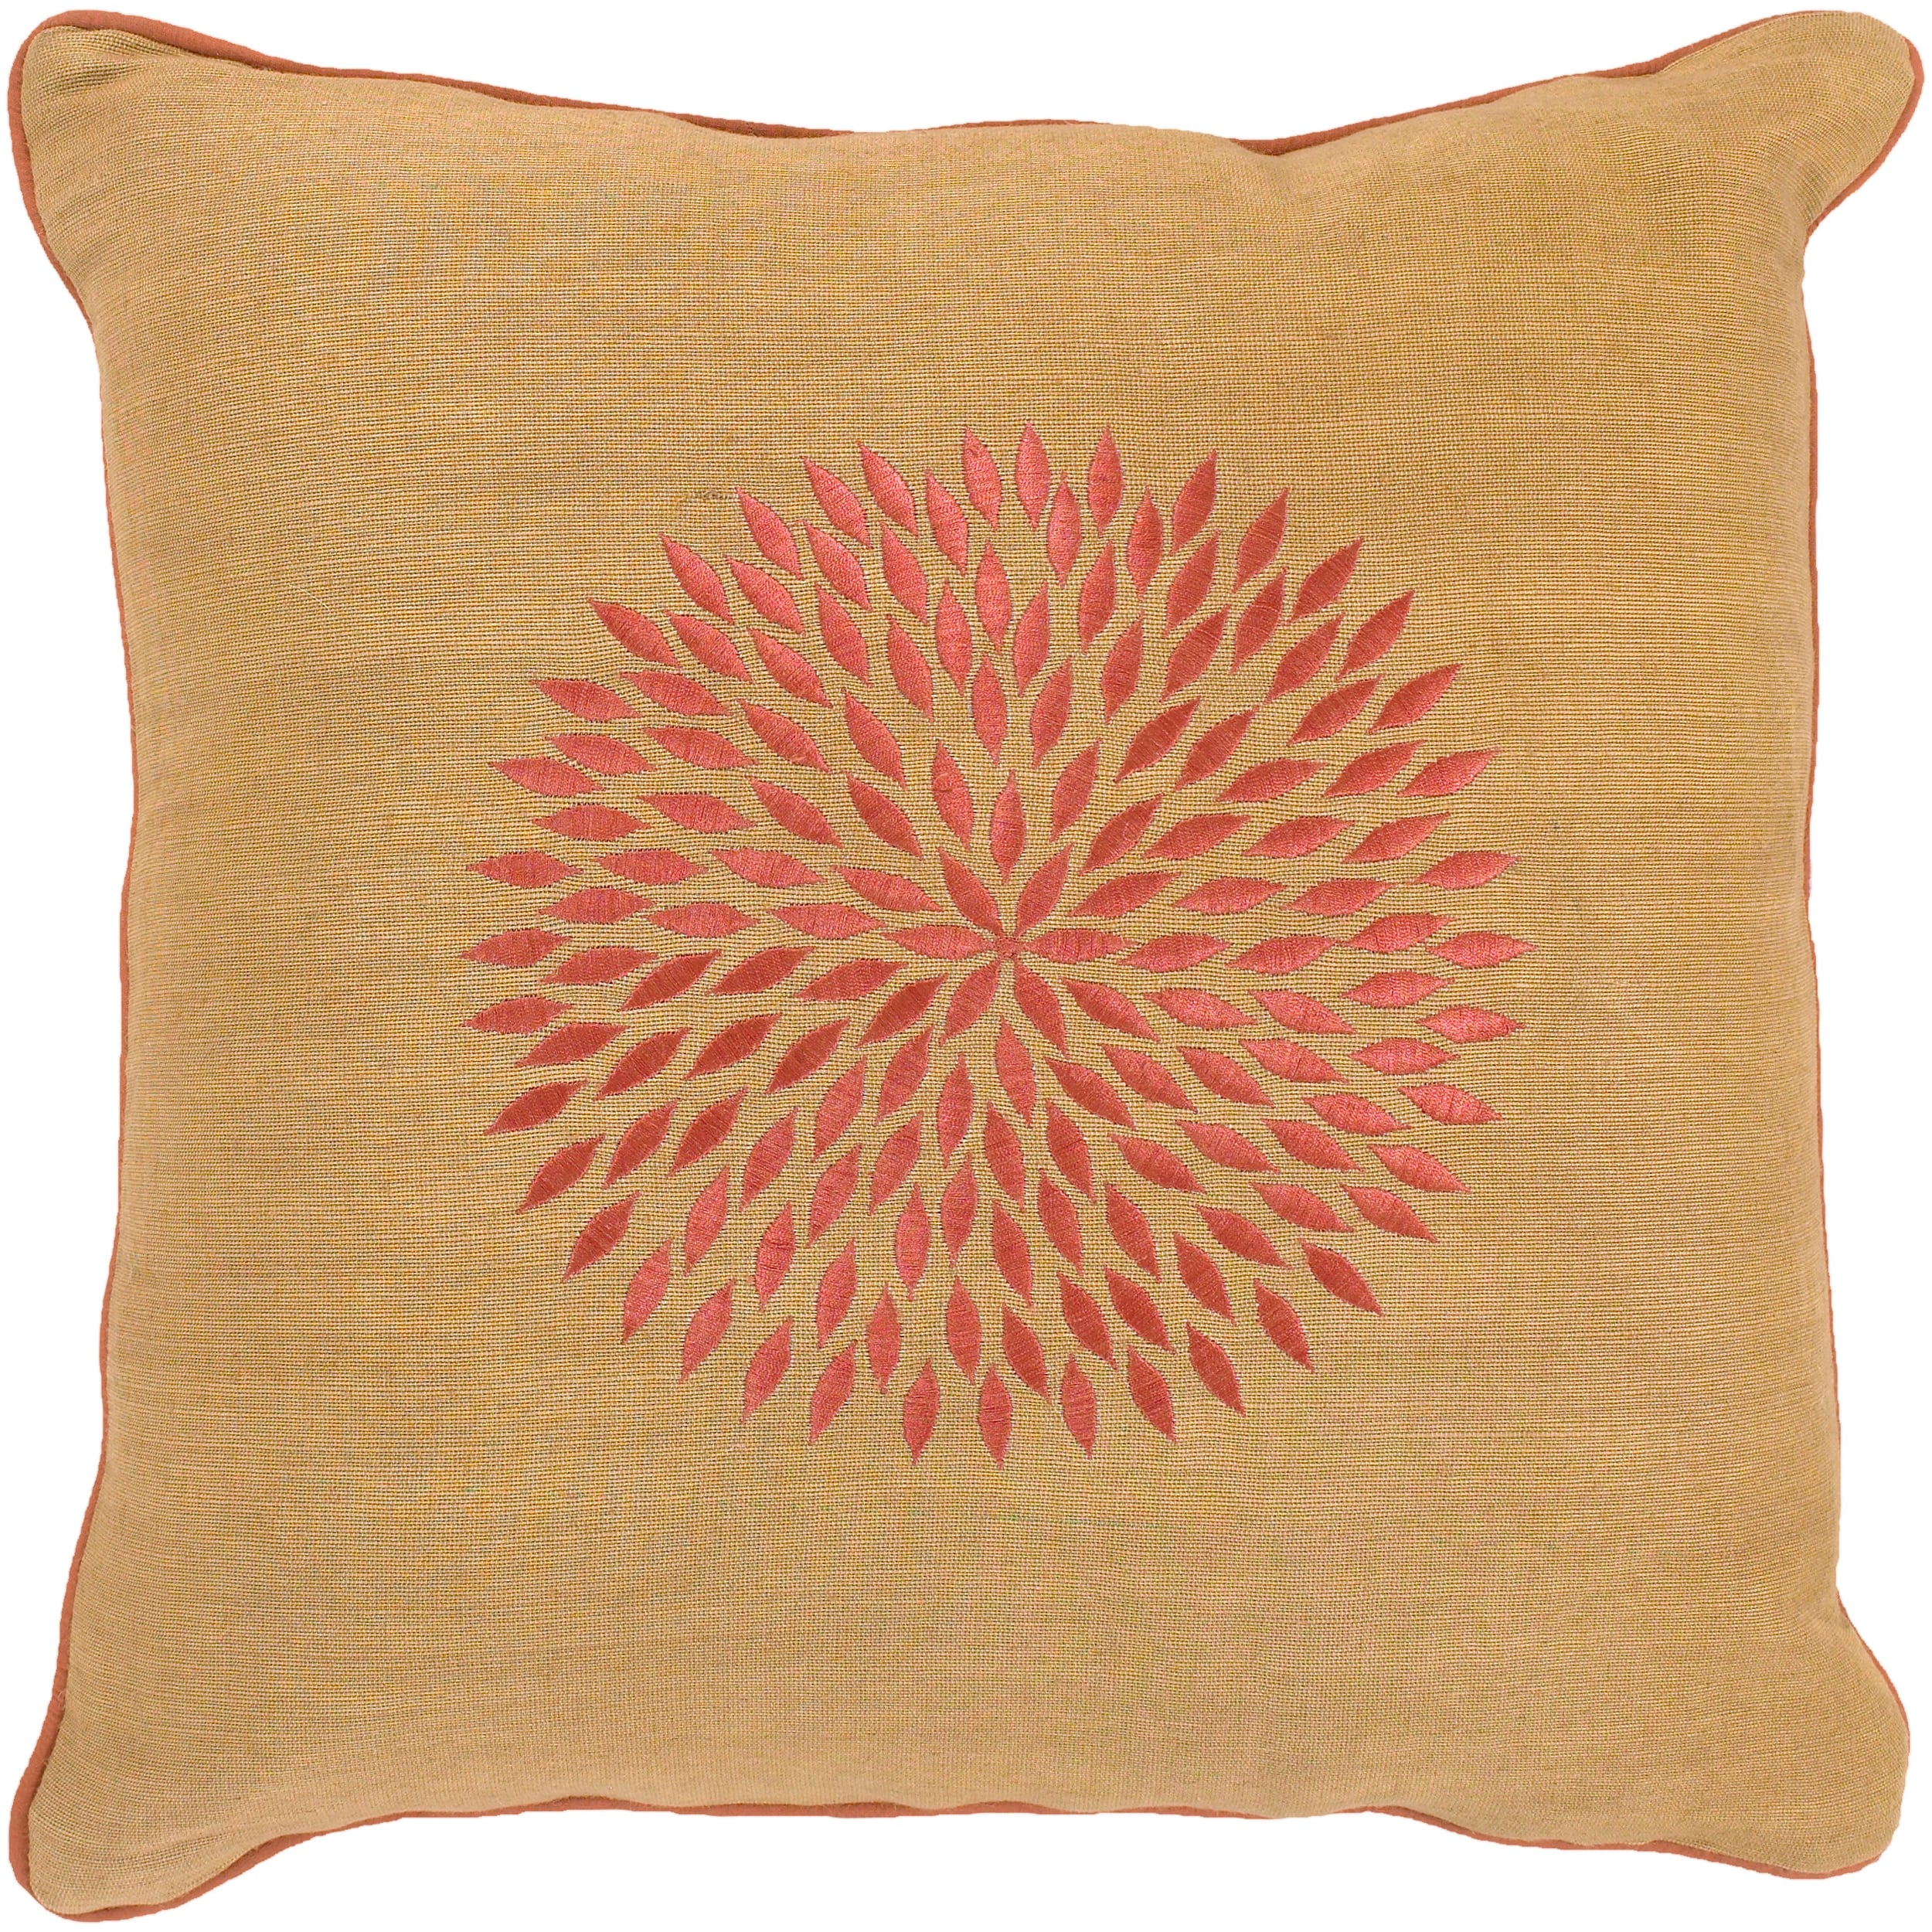 Decorative Salus 22-inch Down Pillow